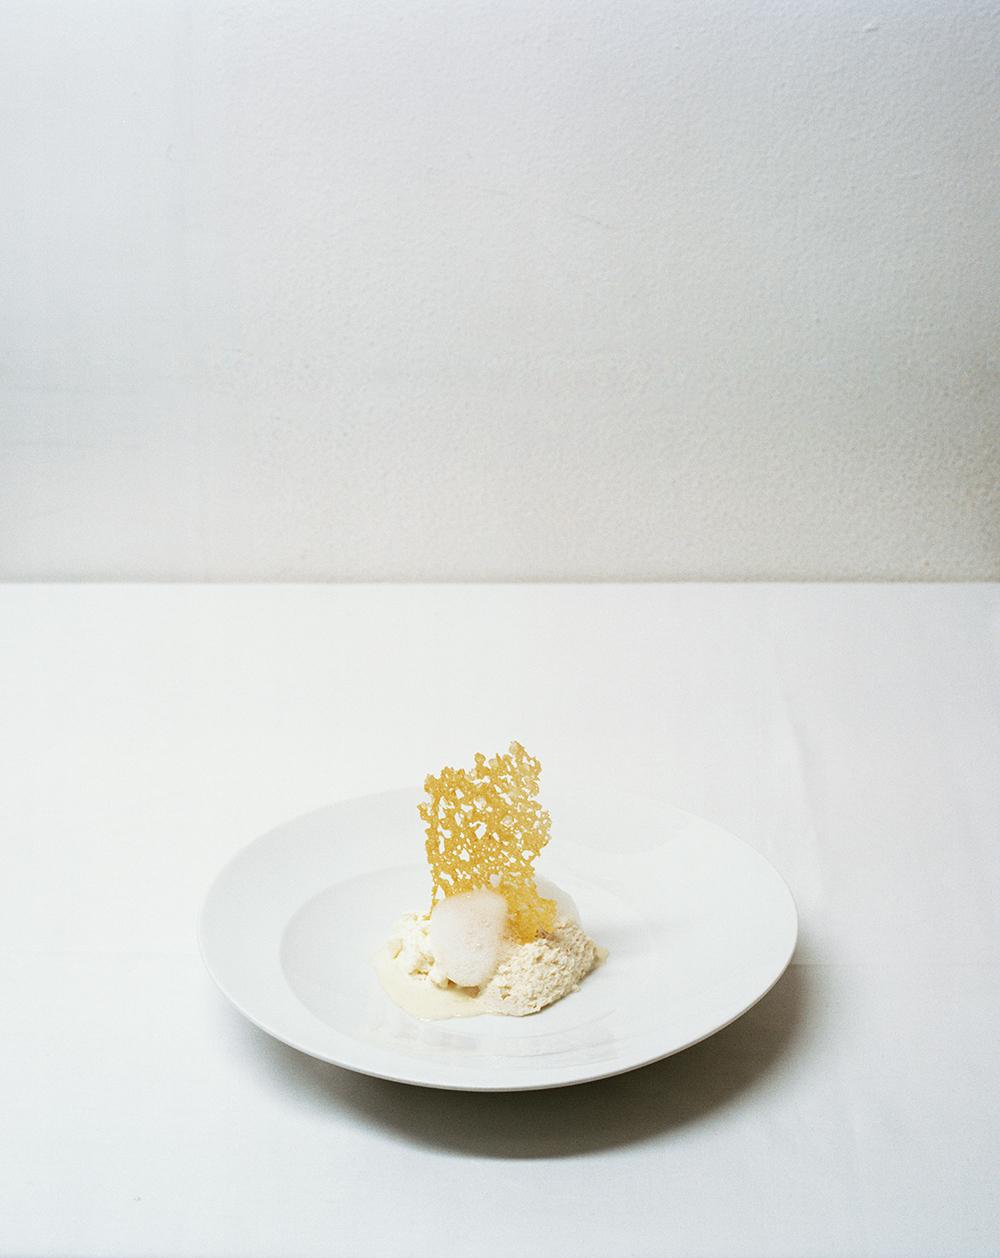 Osteria Francescana, di Massimo Bottura